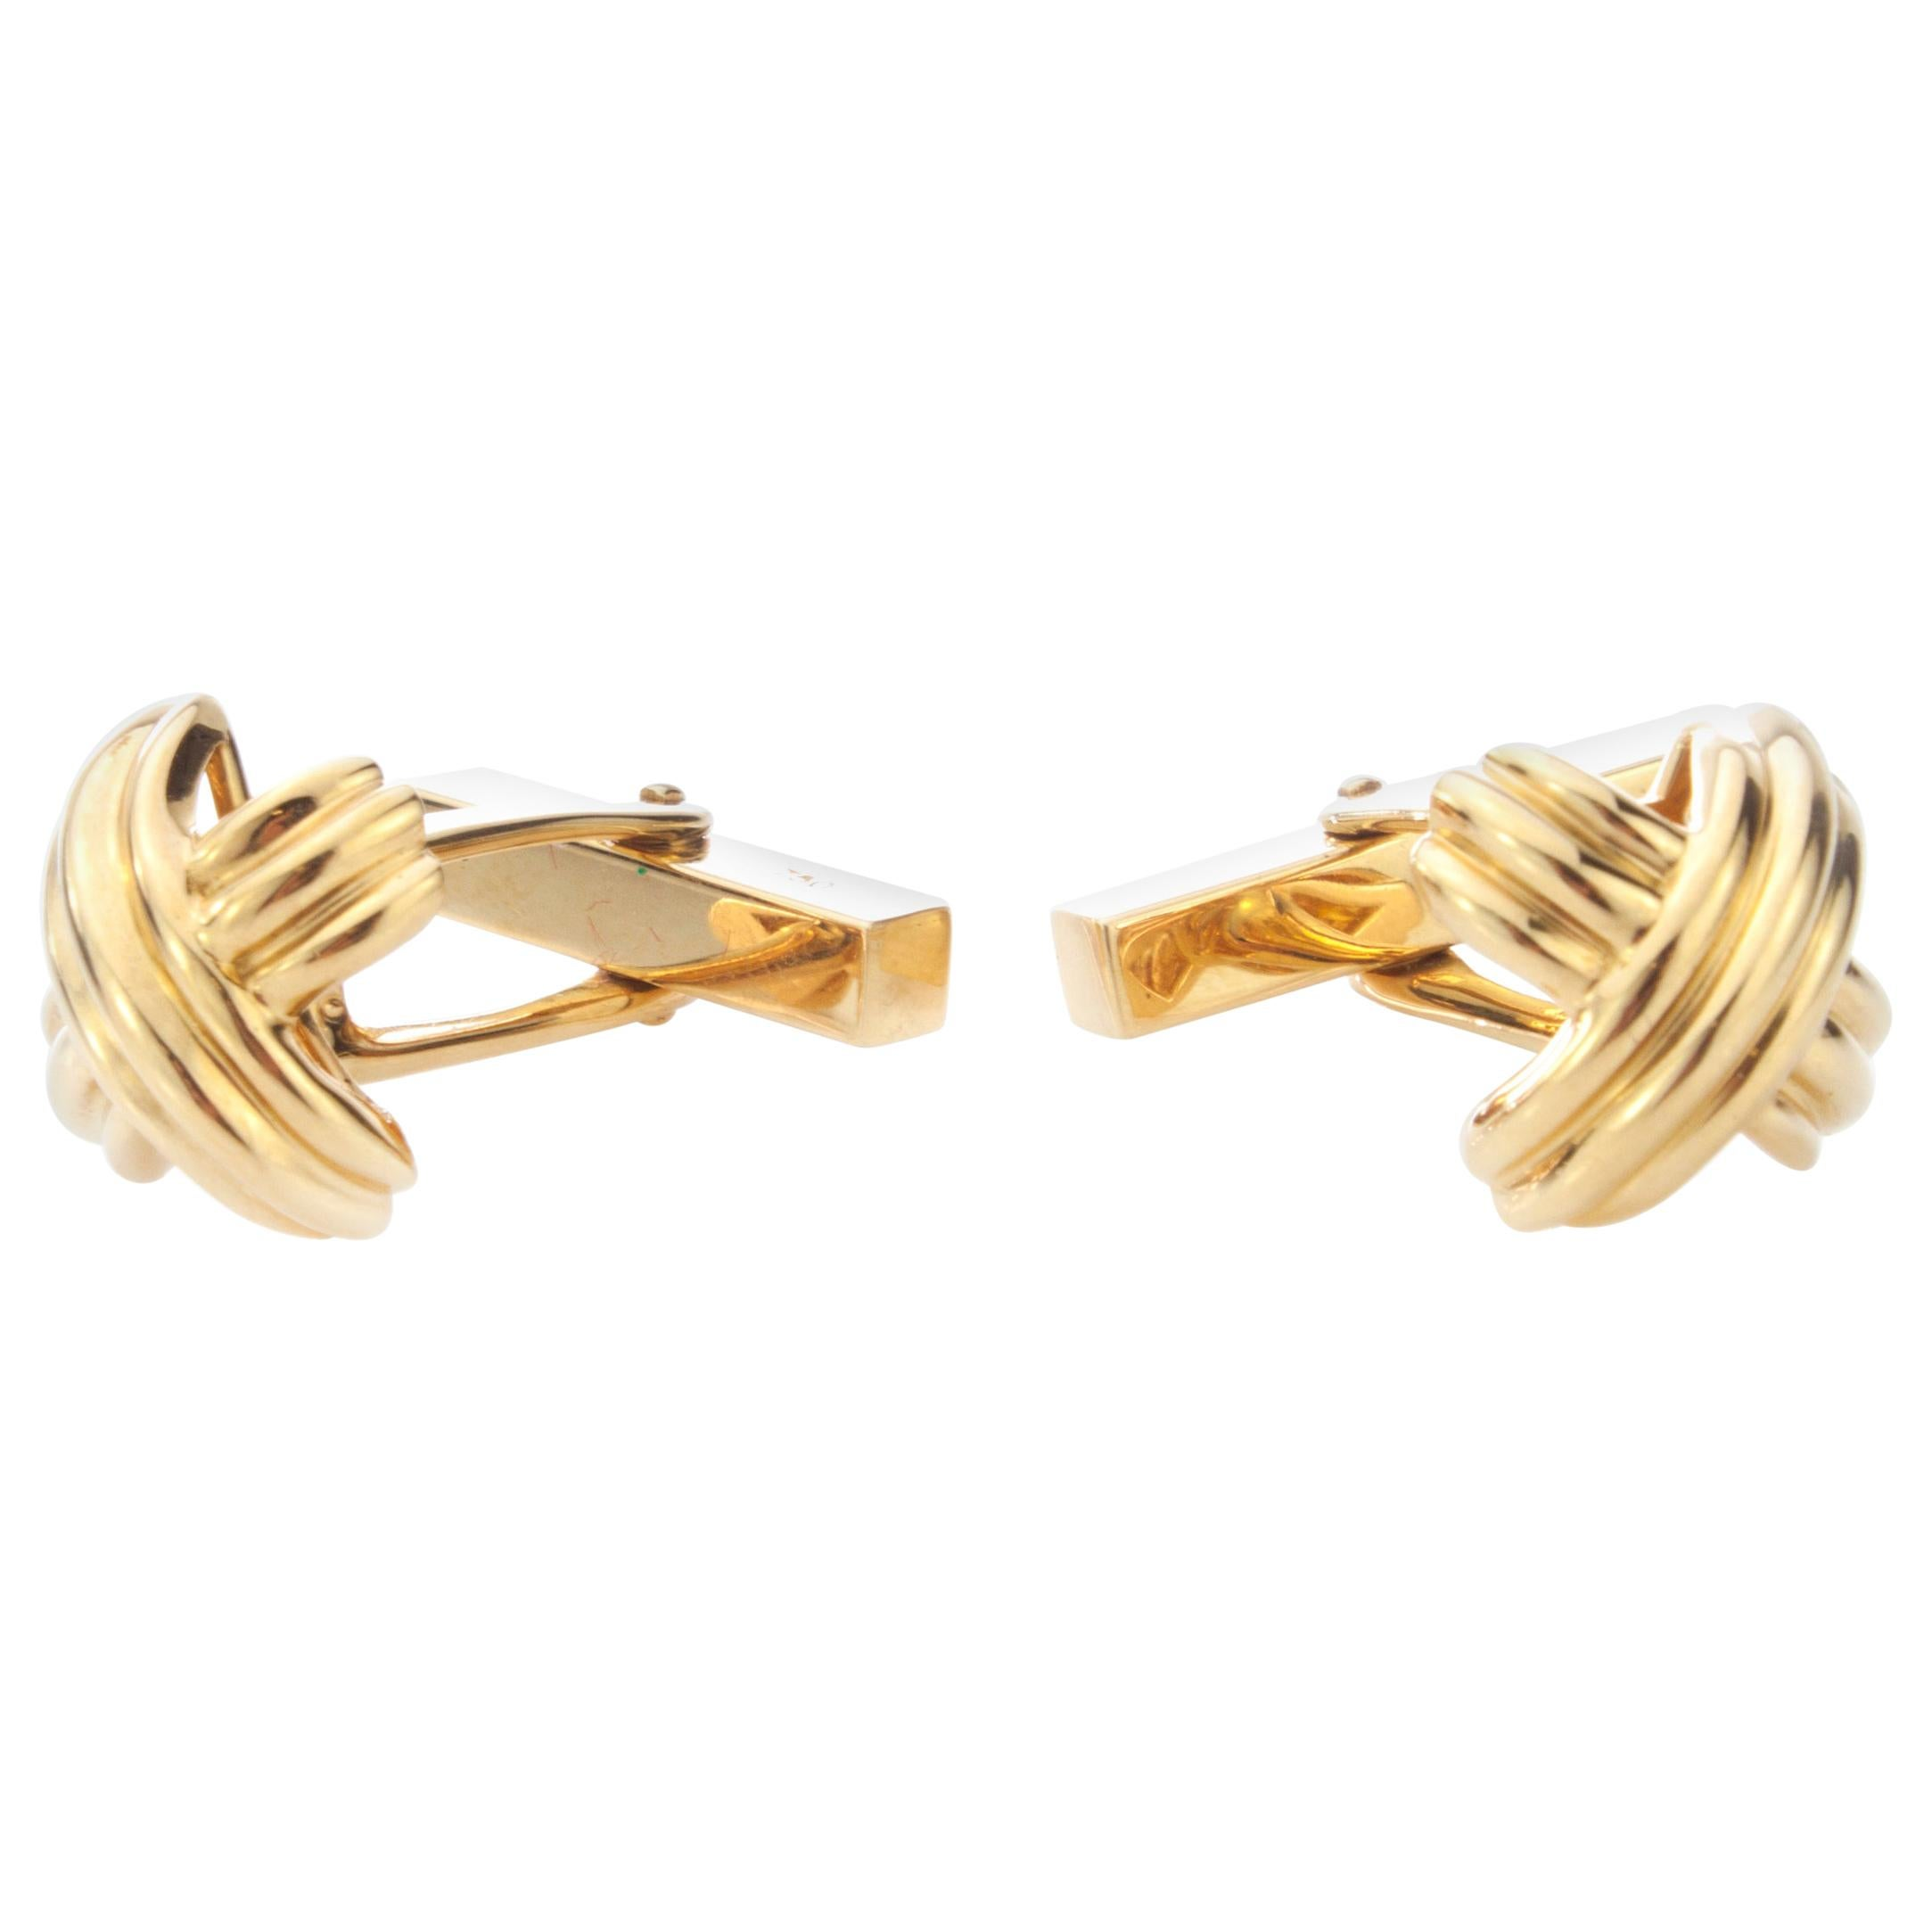 Tiffany & Co. 18 Karat Yellow Gold Cufflinks